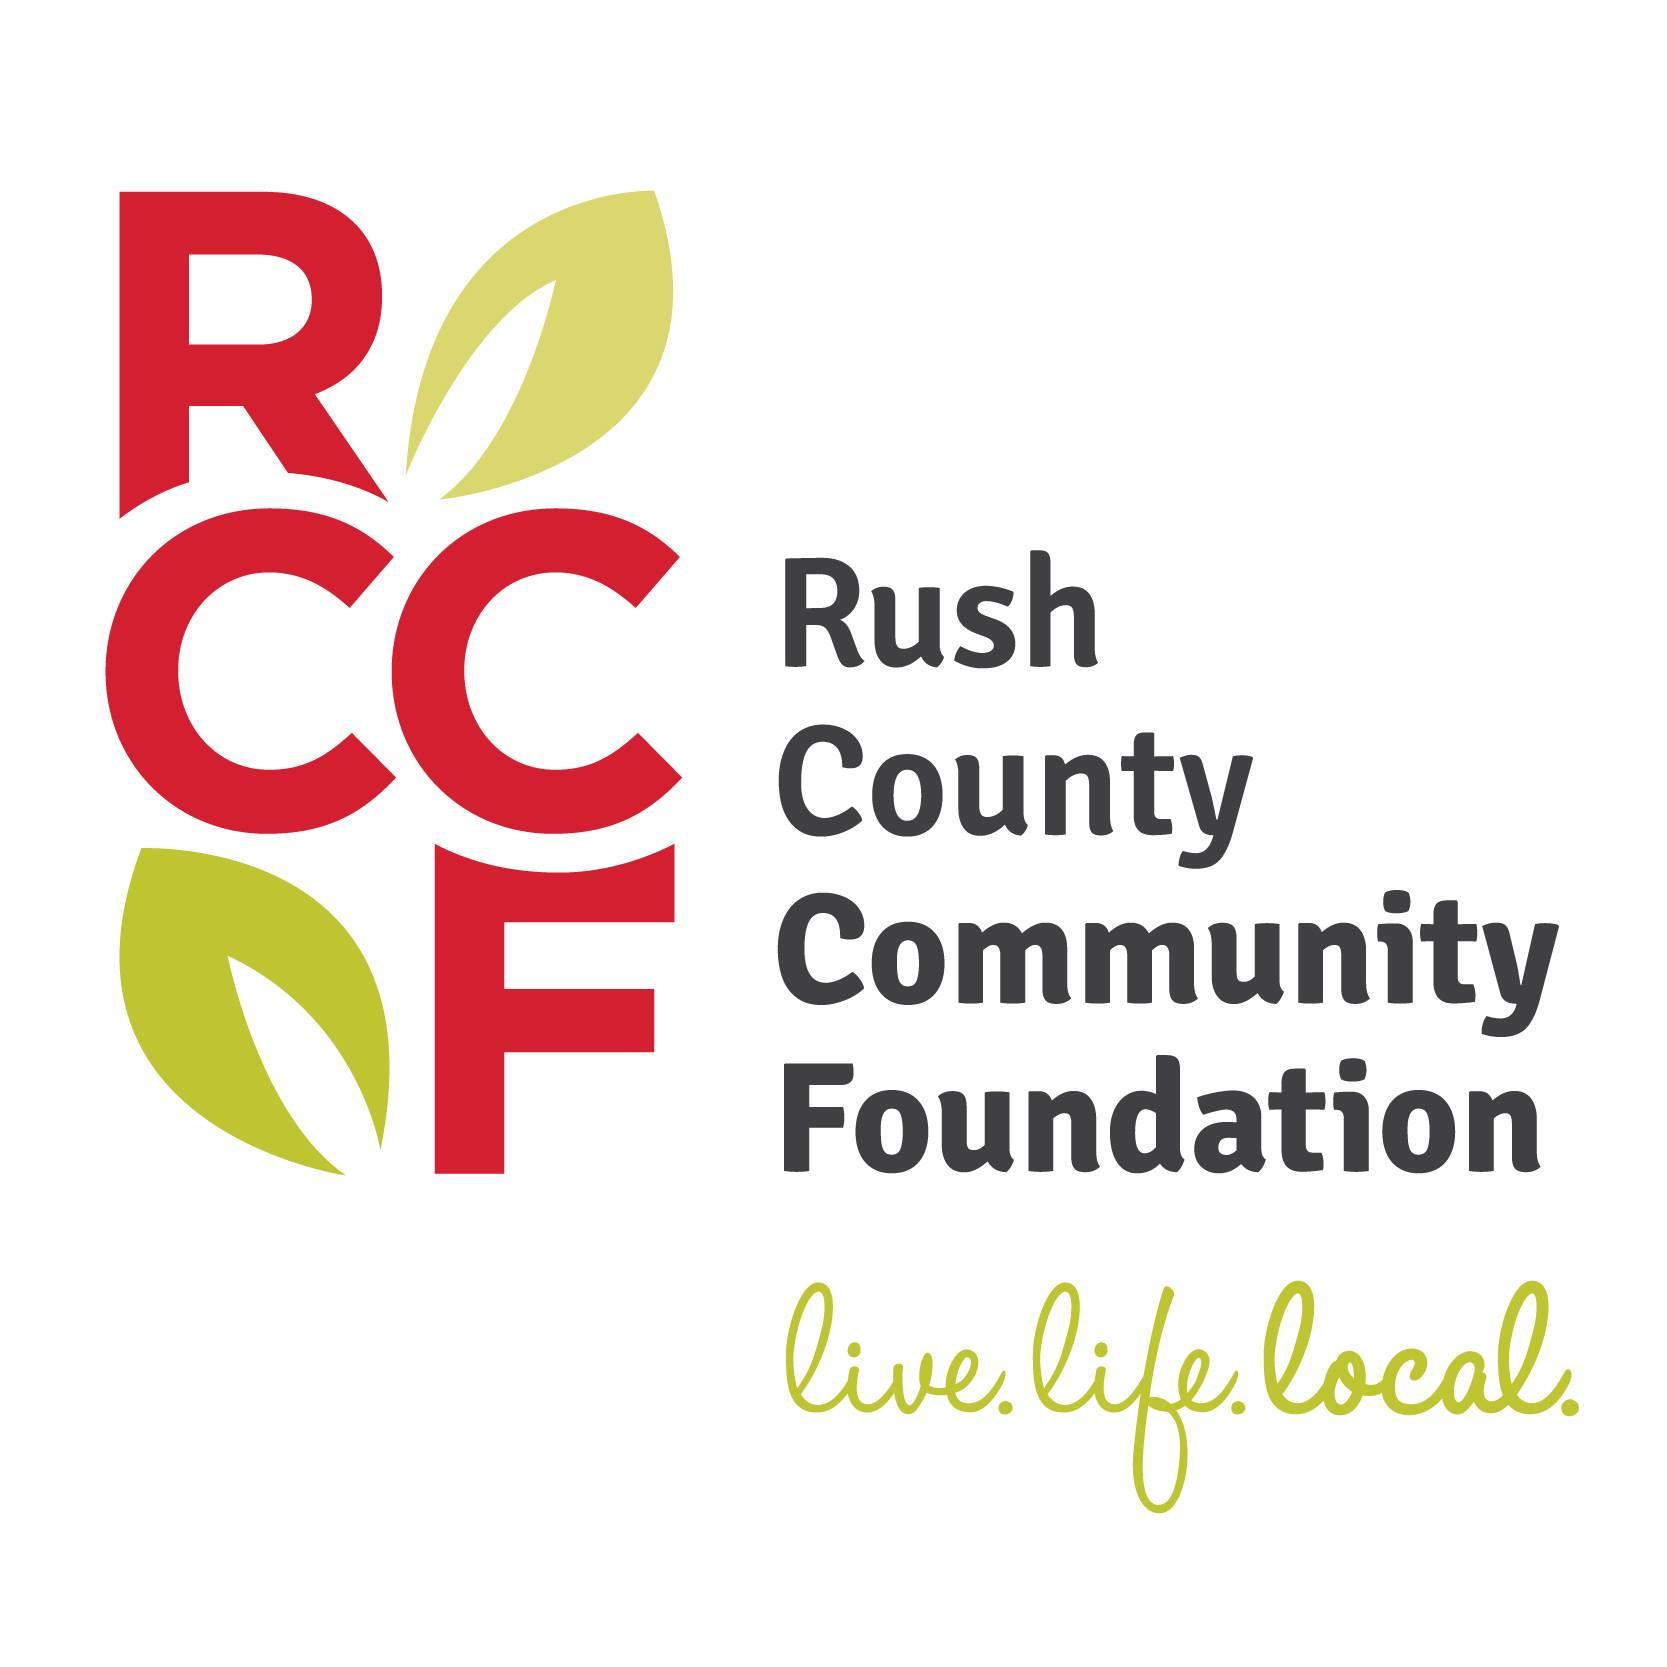 rush county community foundation logo